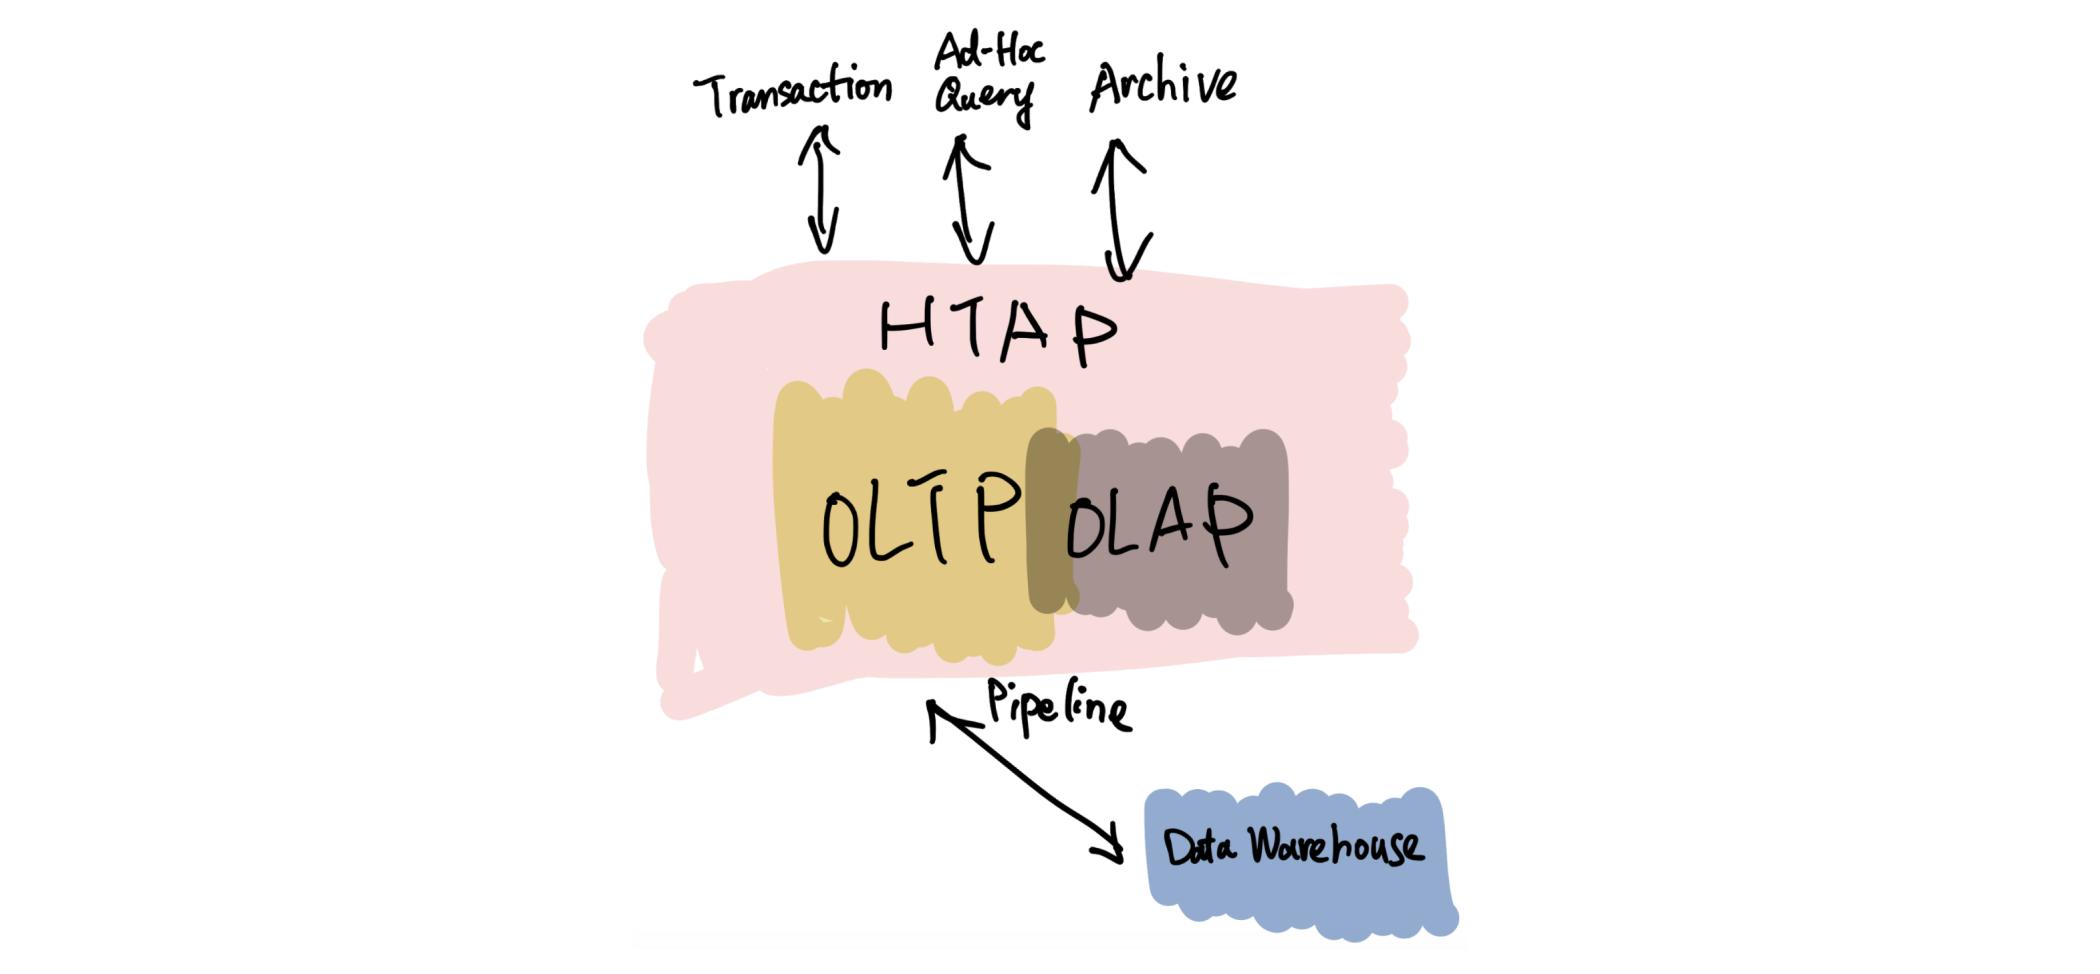 HTAP system